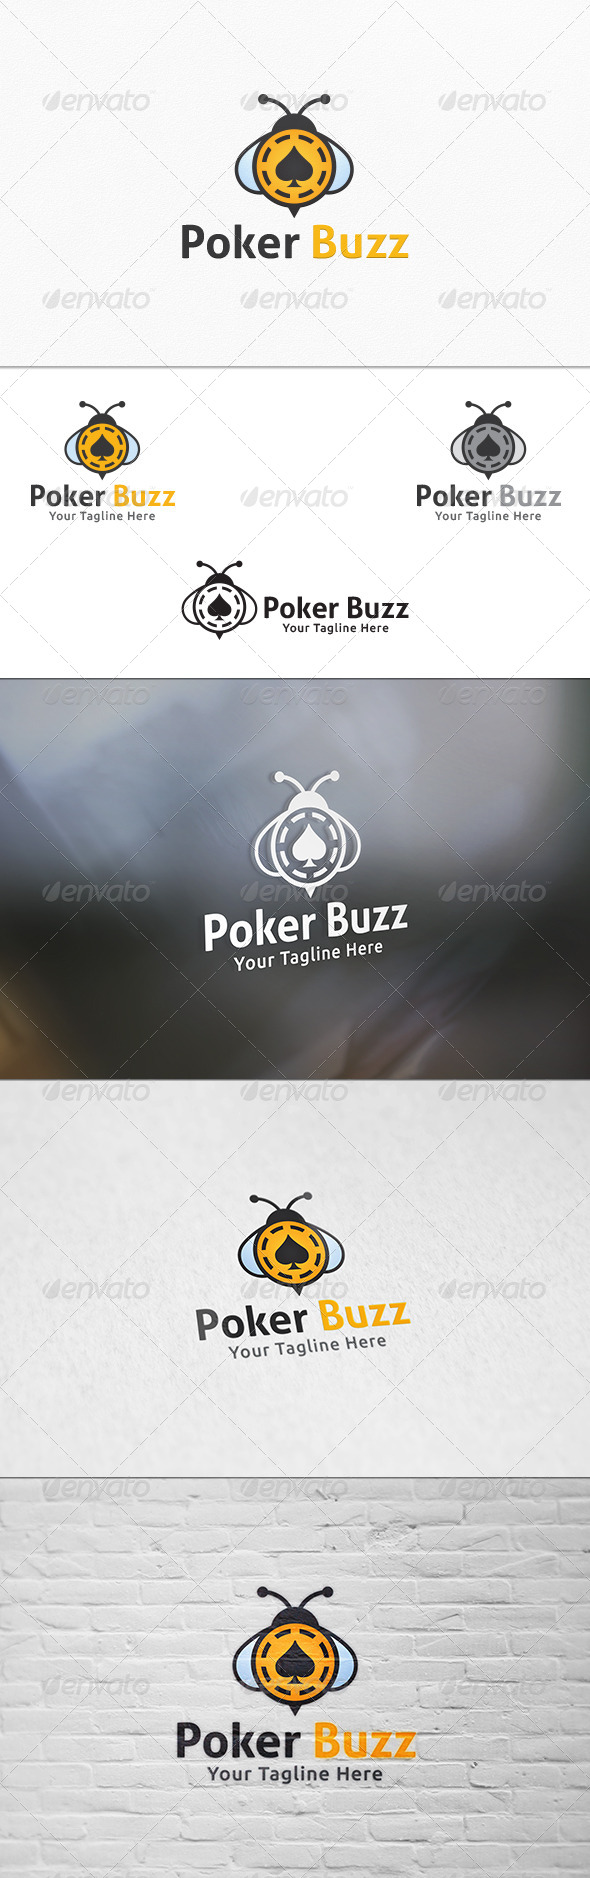 GraphicRiver Poker Buzz Logo Template 7520191